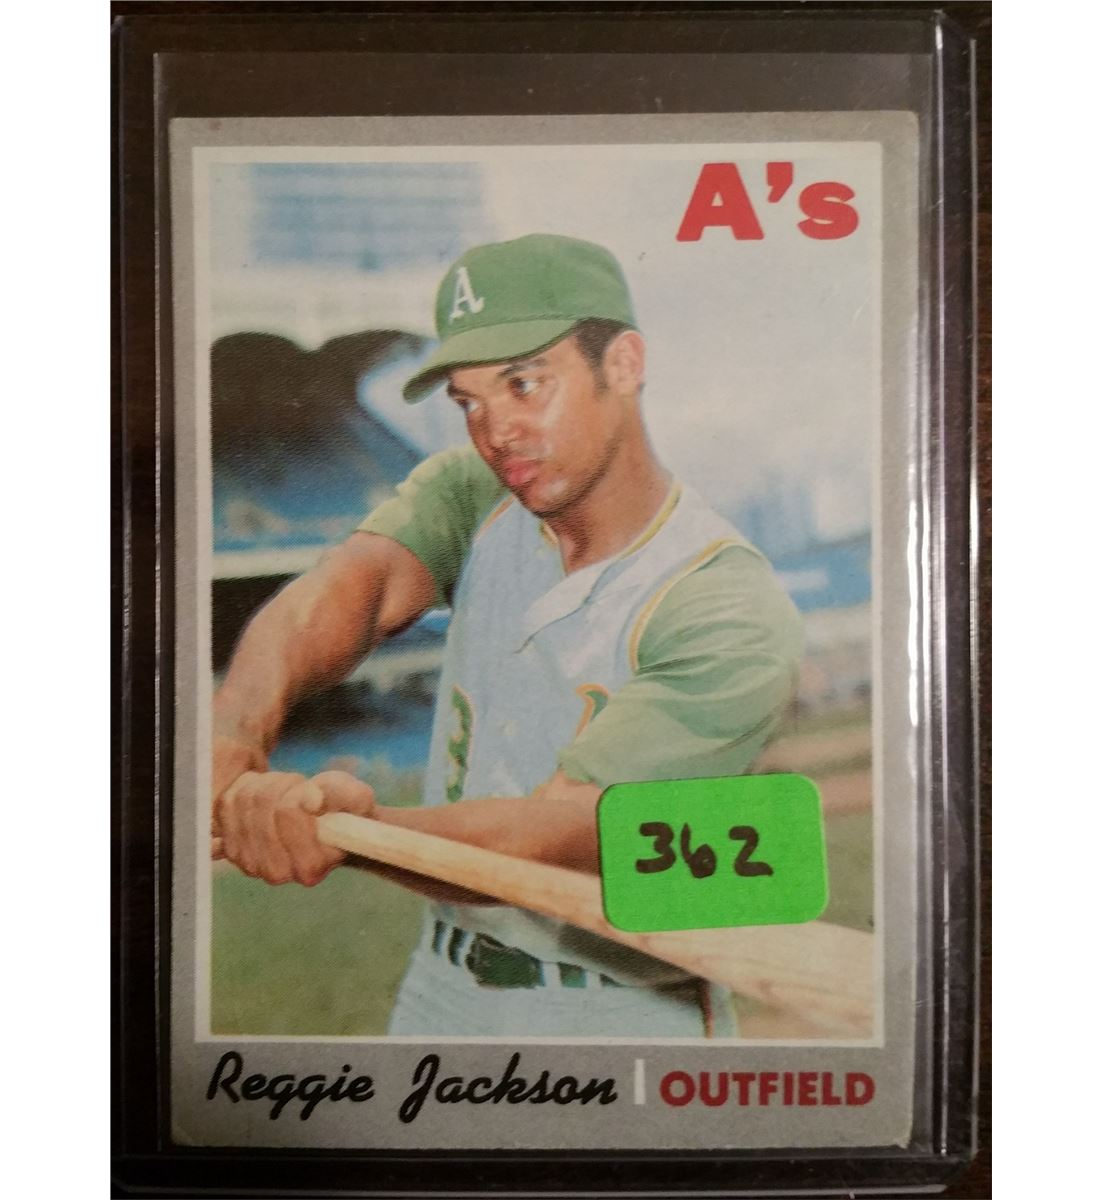 1970 Topps Reggie Jackson 2nd Year Card 140